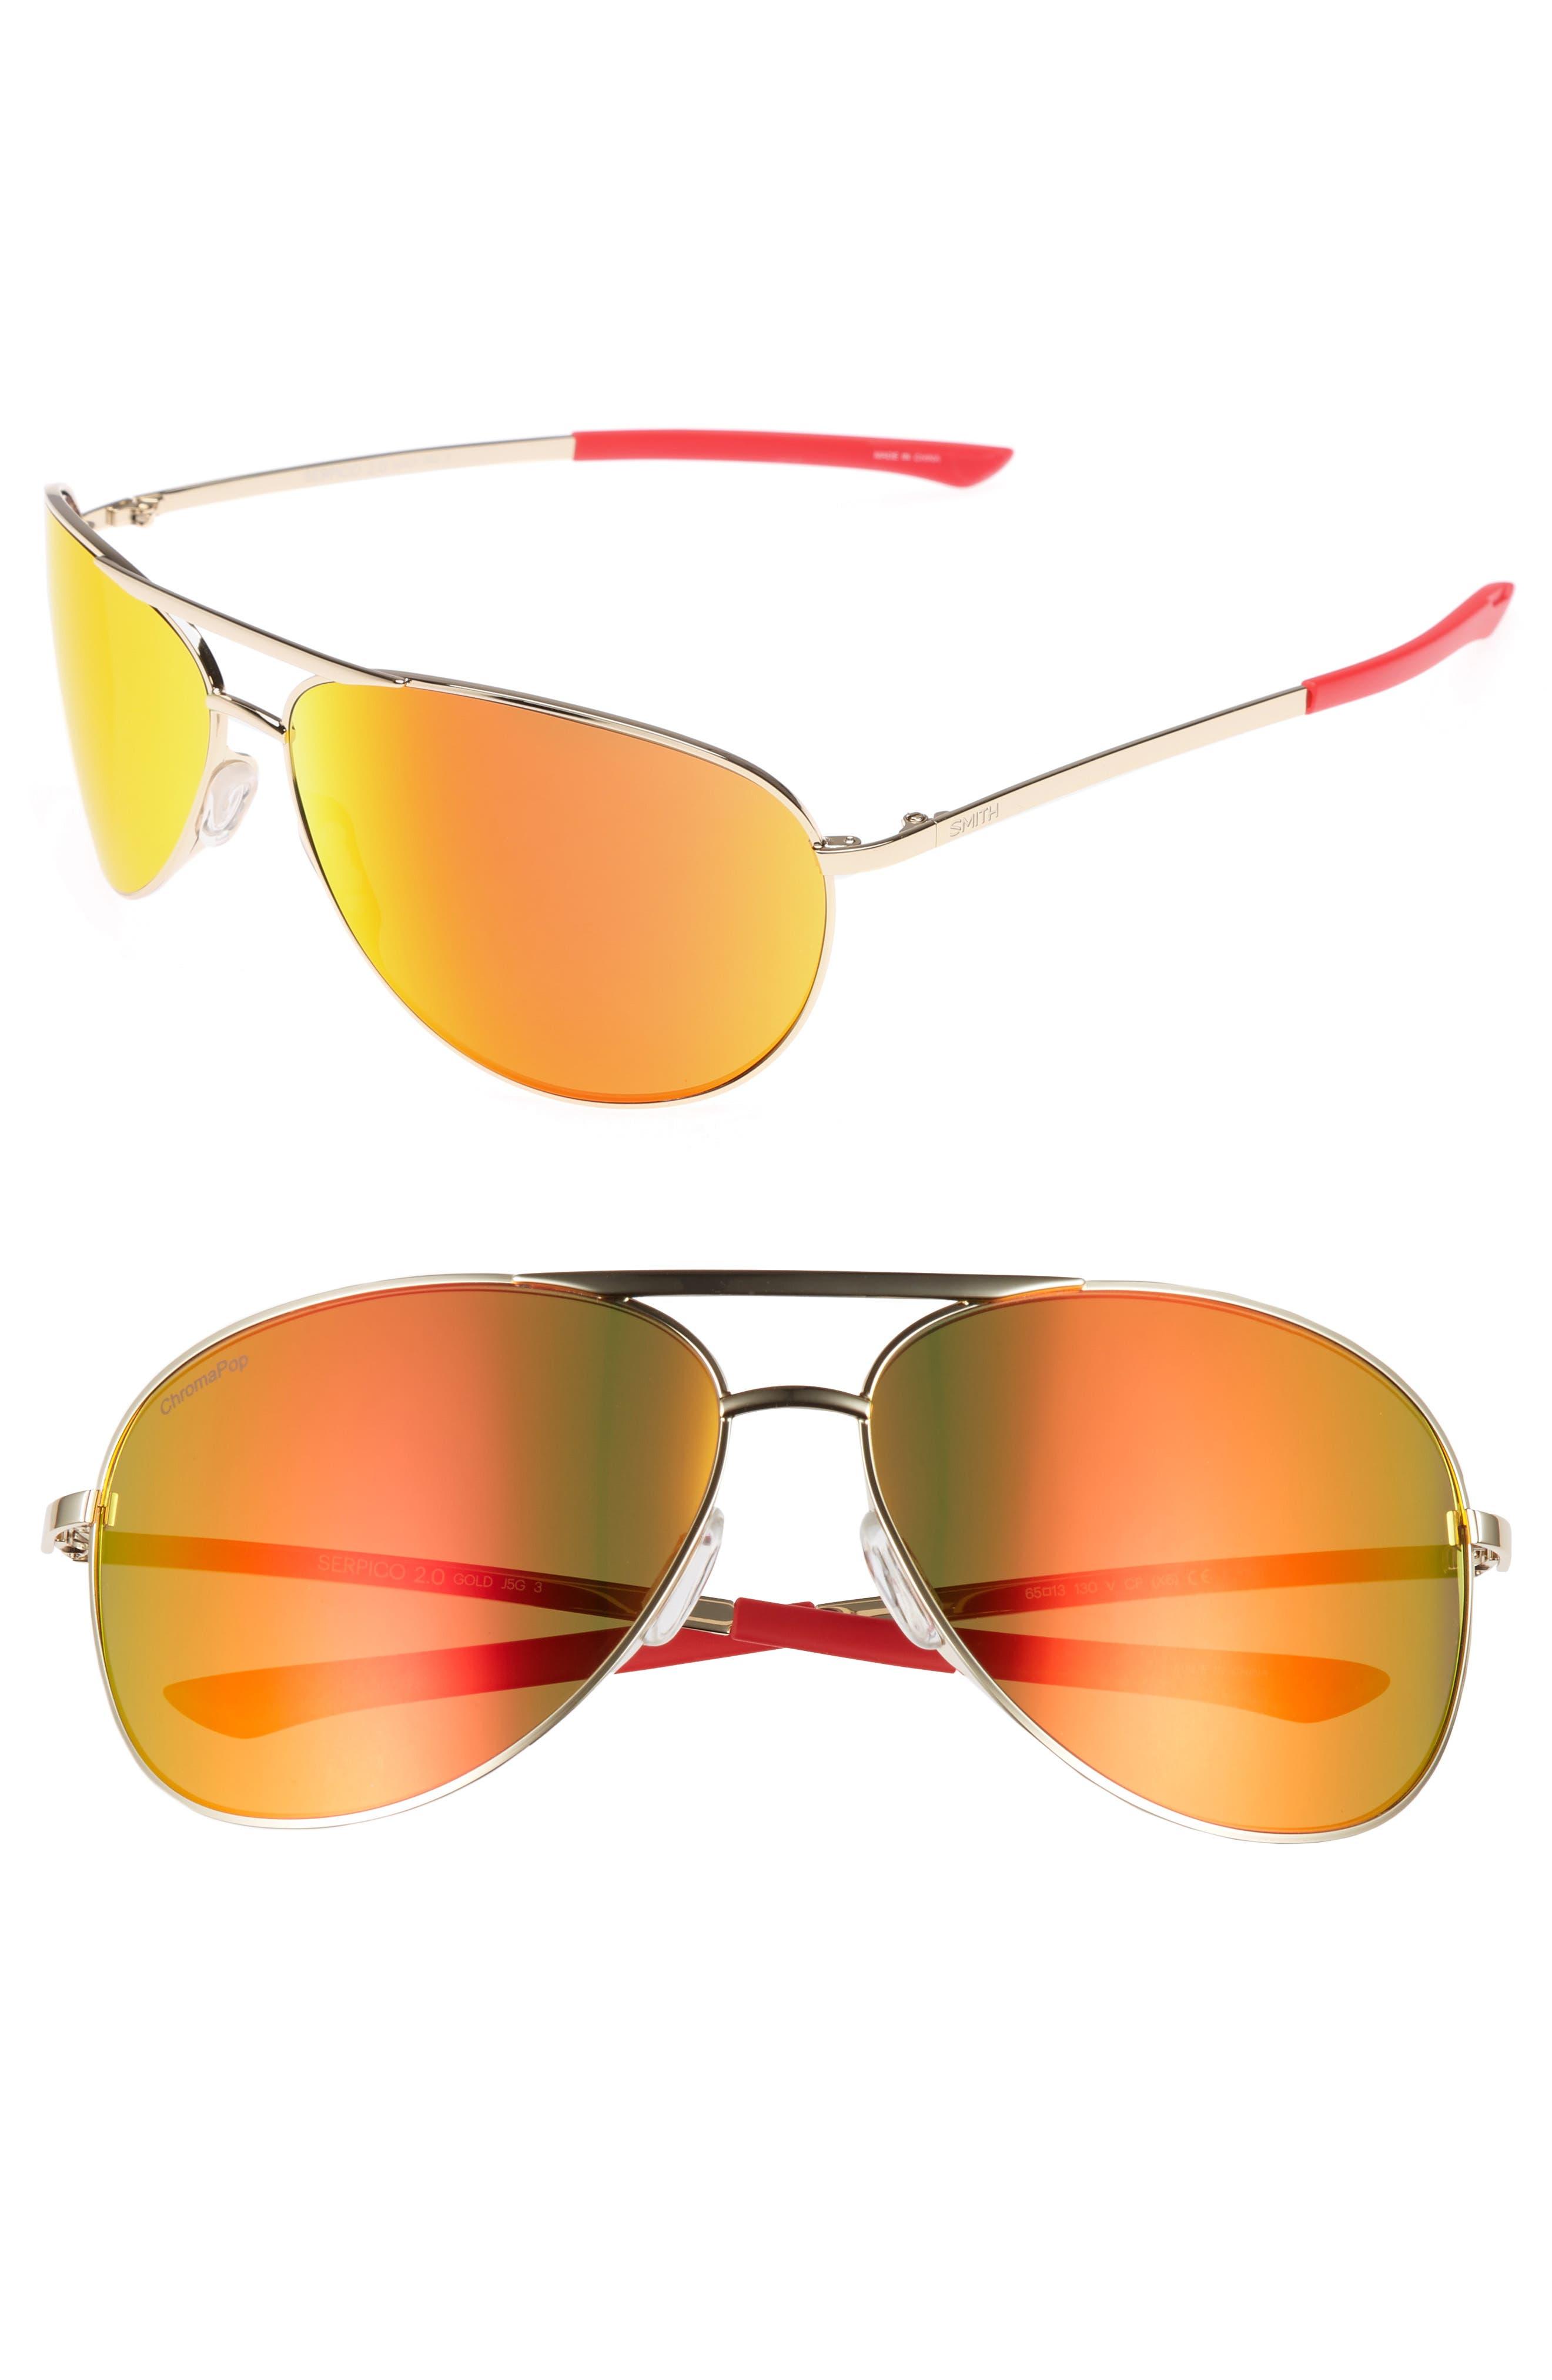 Alternate Image 1 Selected - Smith Serpico 2 65mm Mirrored ChromaPop™ Polarized Aviator Sunglasses